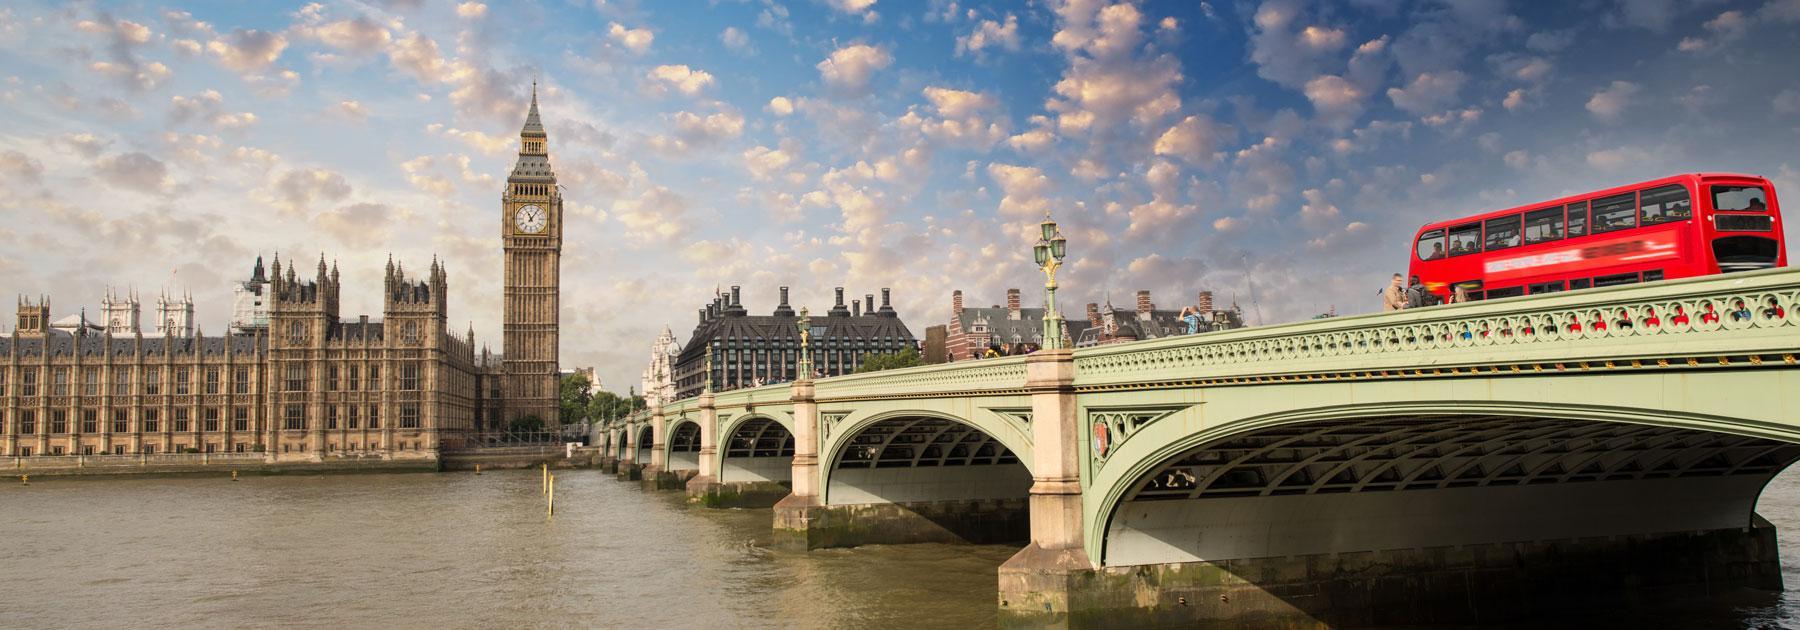 europe+travel+advice